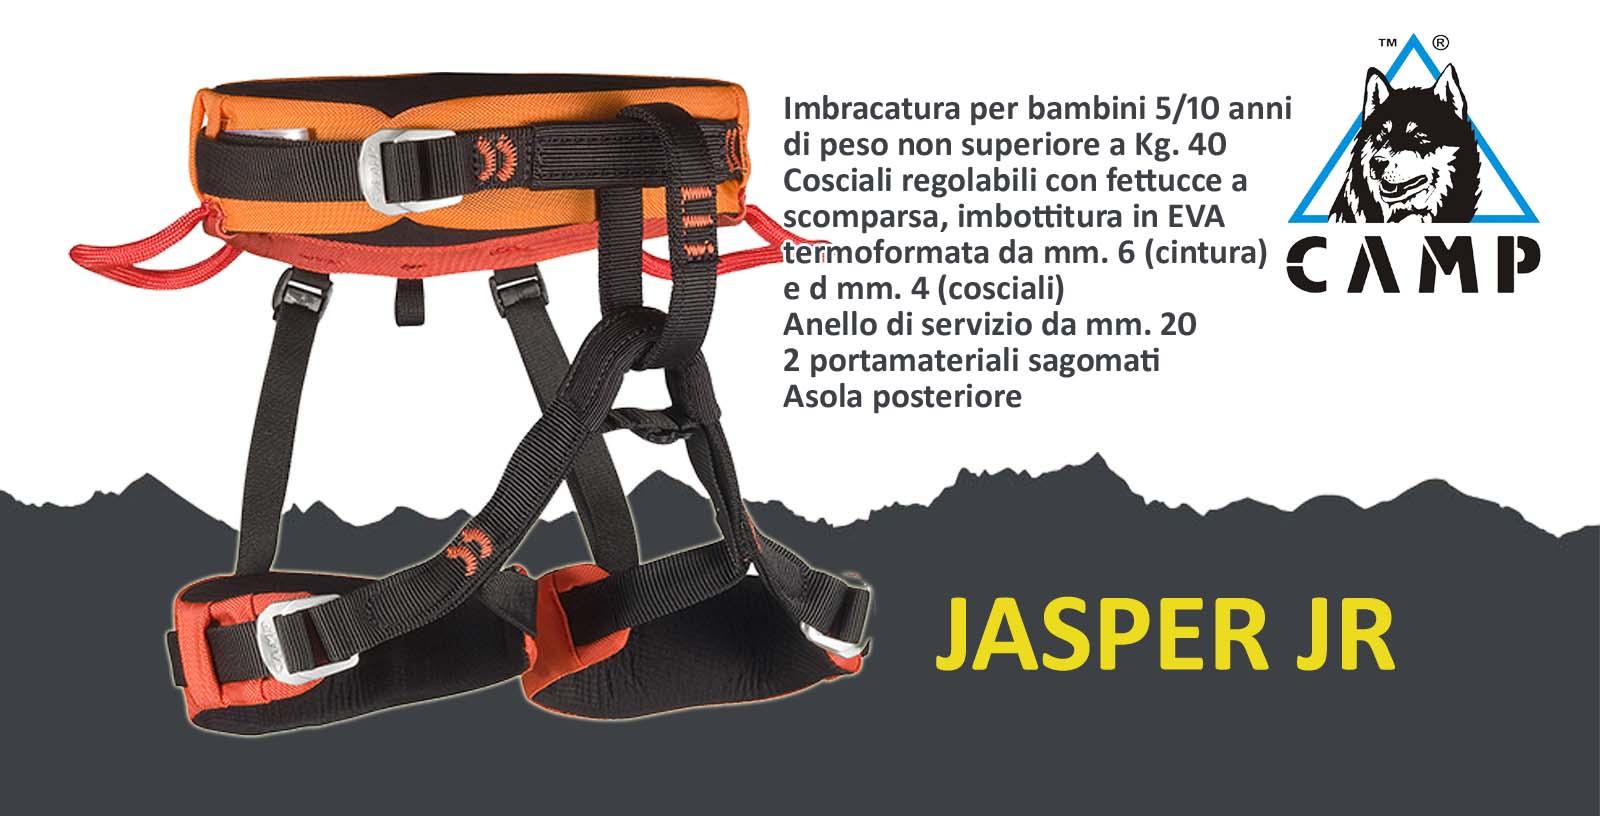 camp-jasper-jr